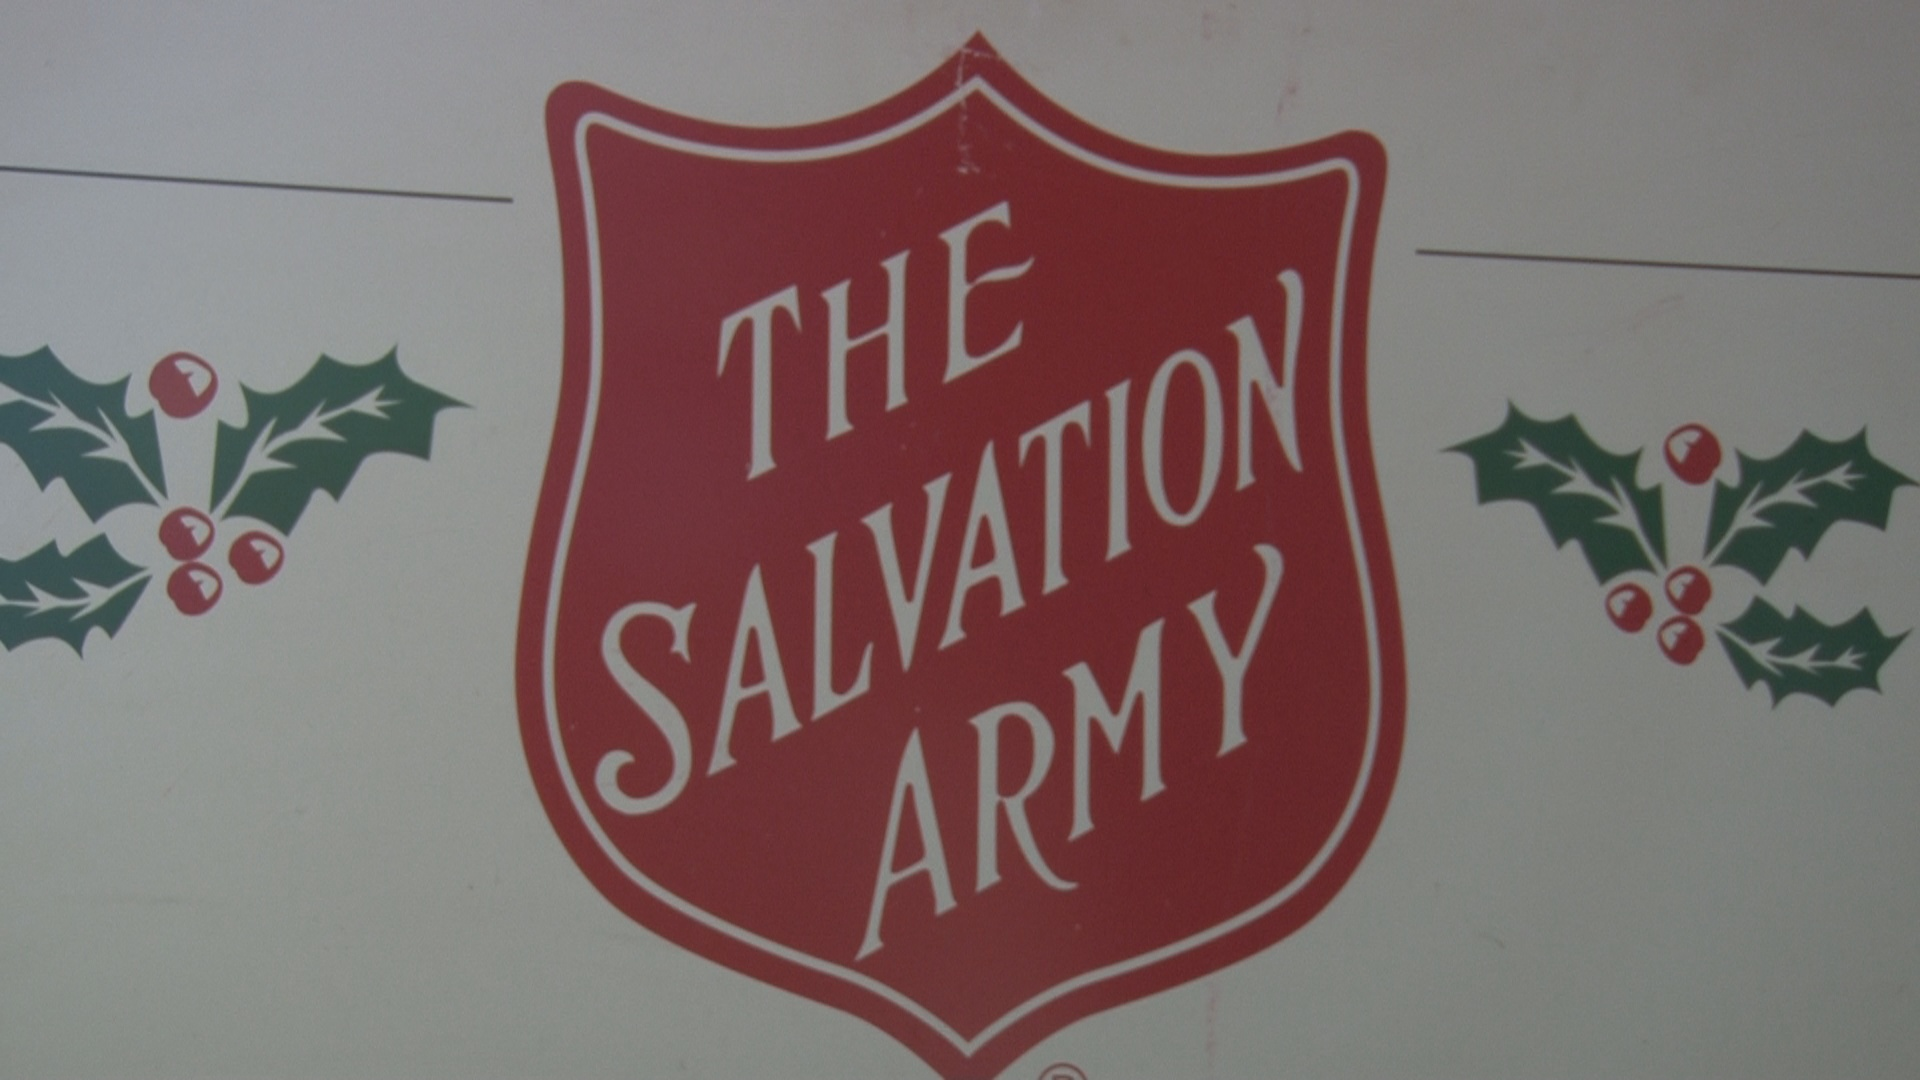 salvation army_1510611913930.jpg